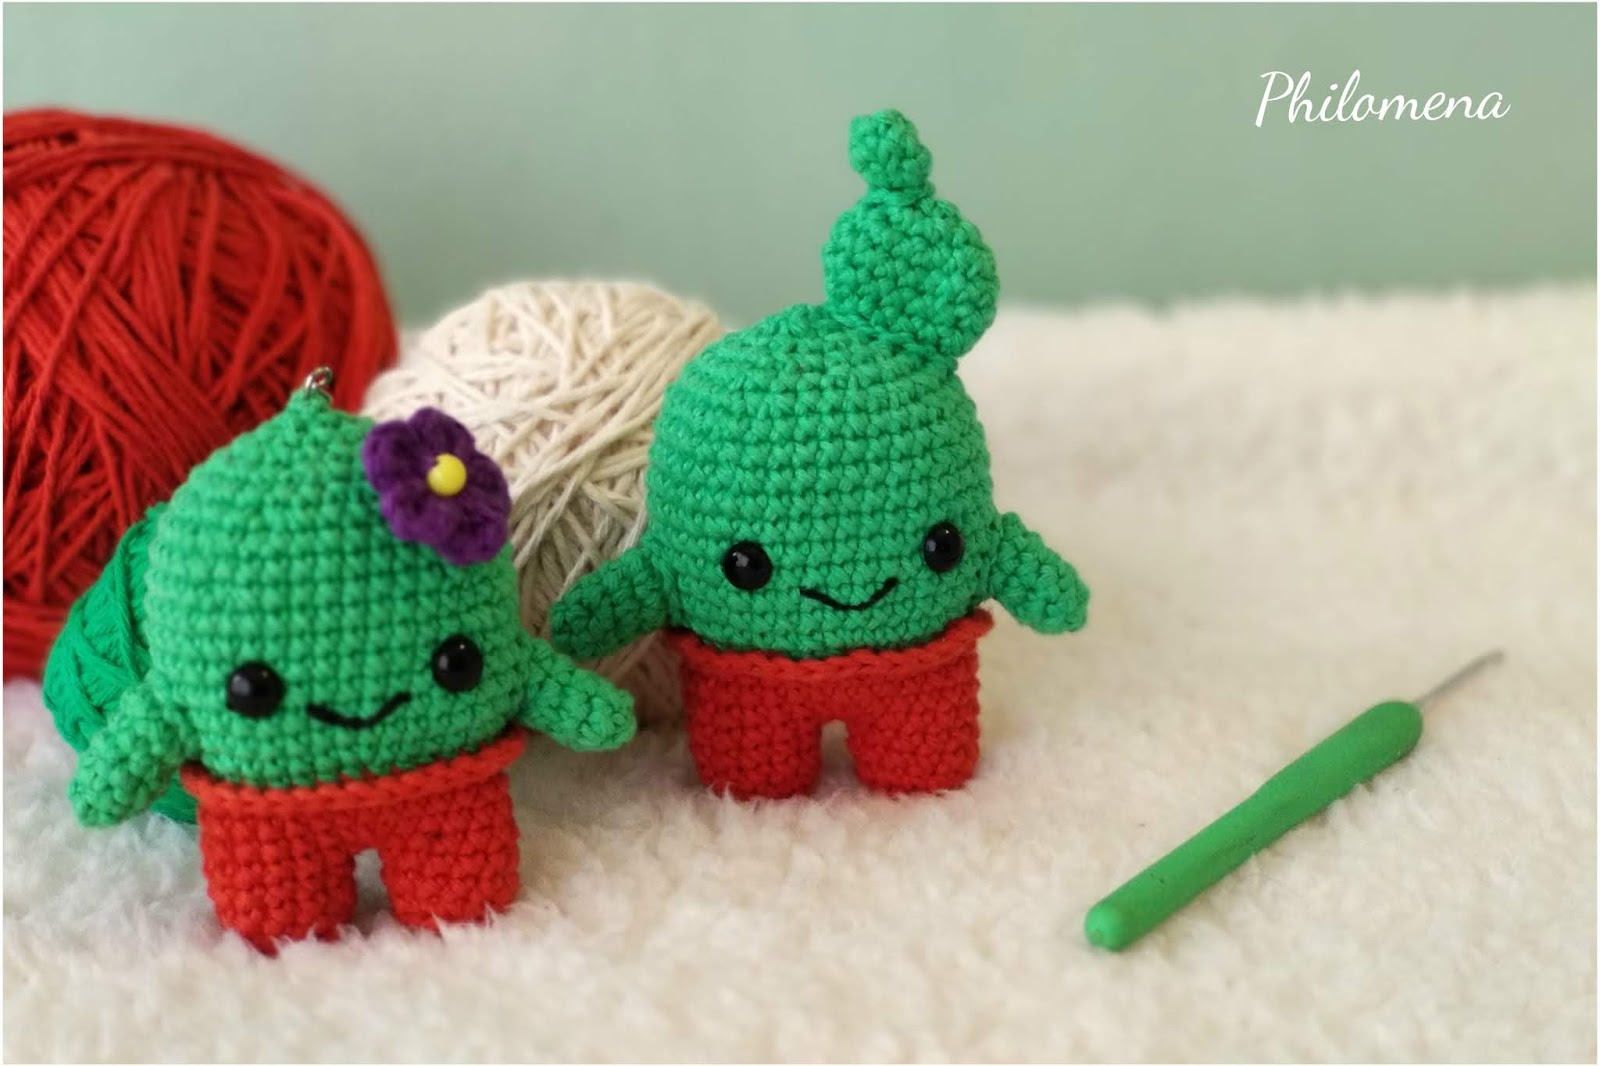 Llaveros crochet cactus, tres formas – Ana Fonty | 1066x1600